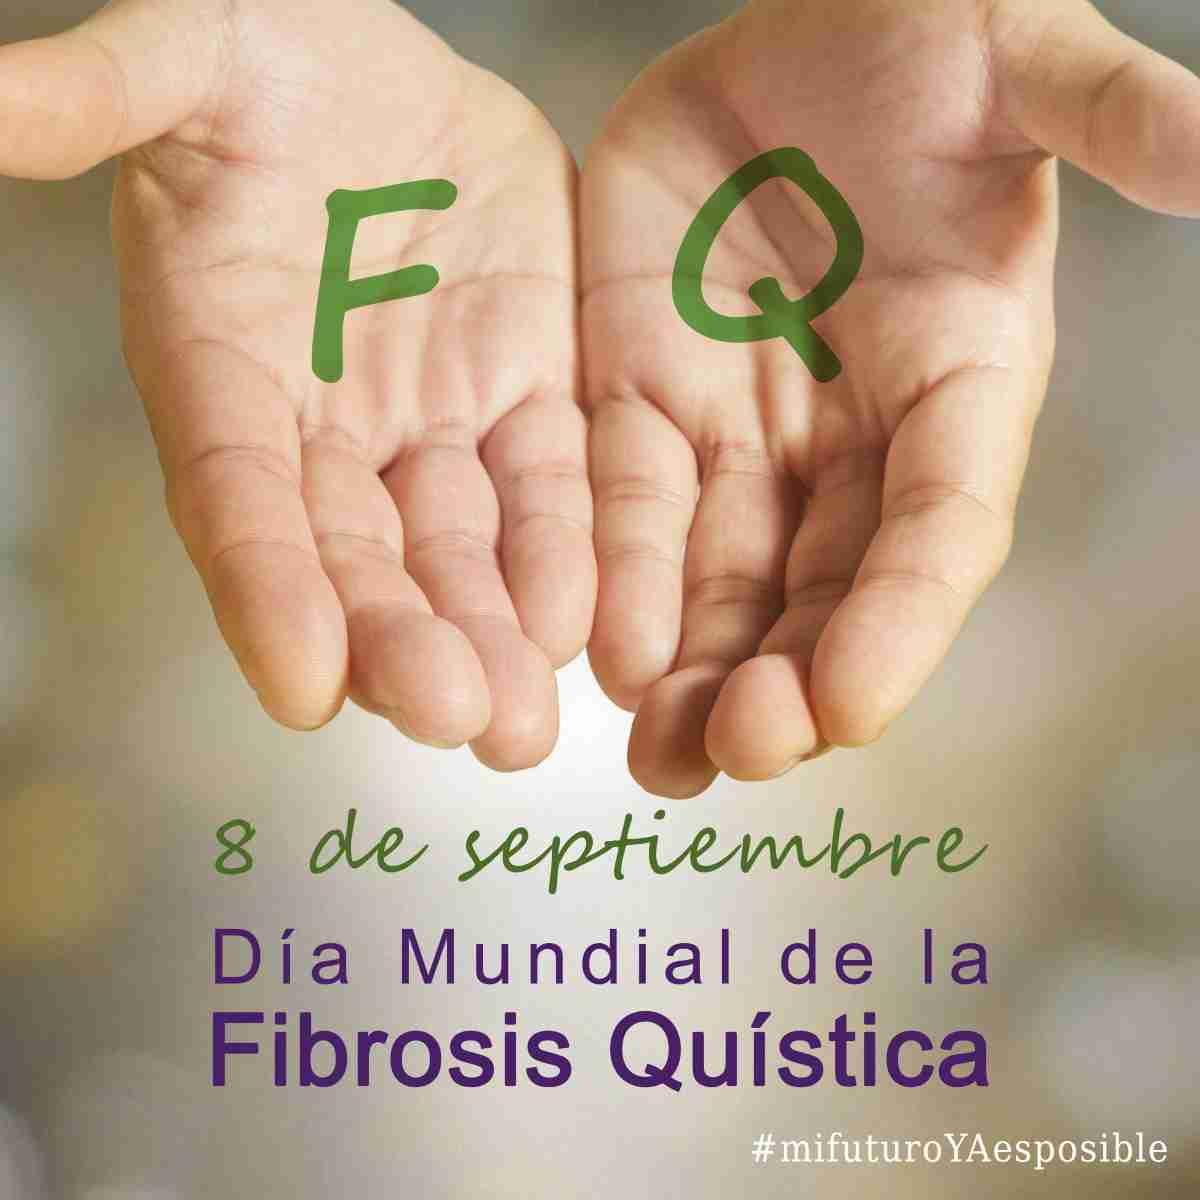 dia_mundial_de_la_fibrosis_quistica